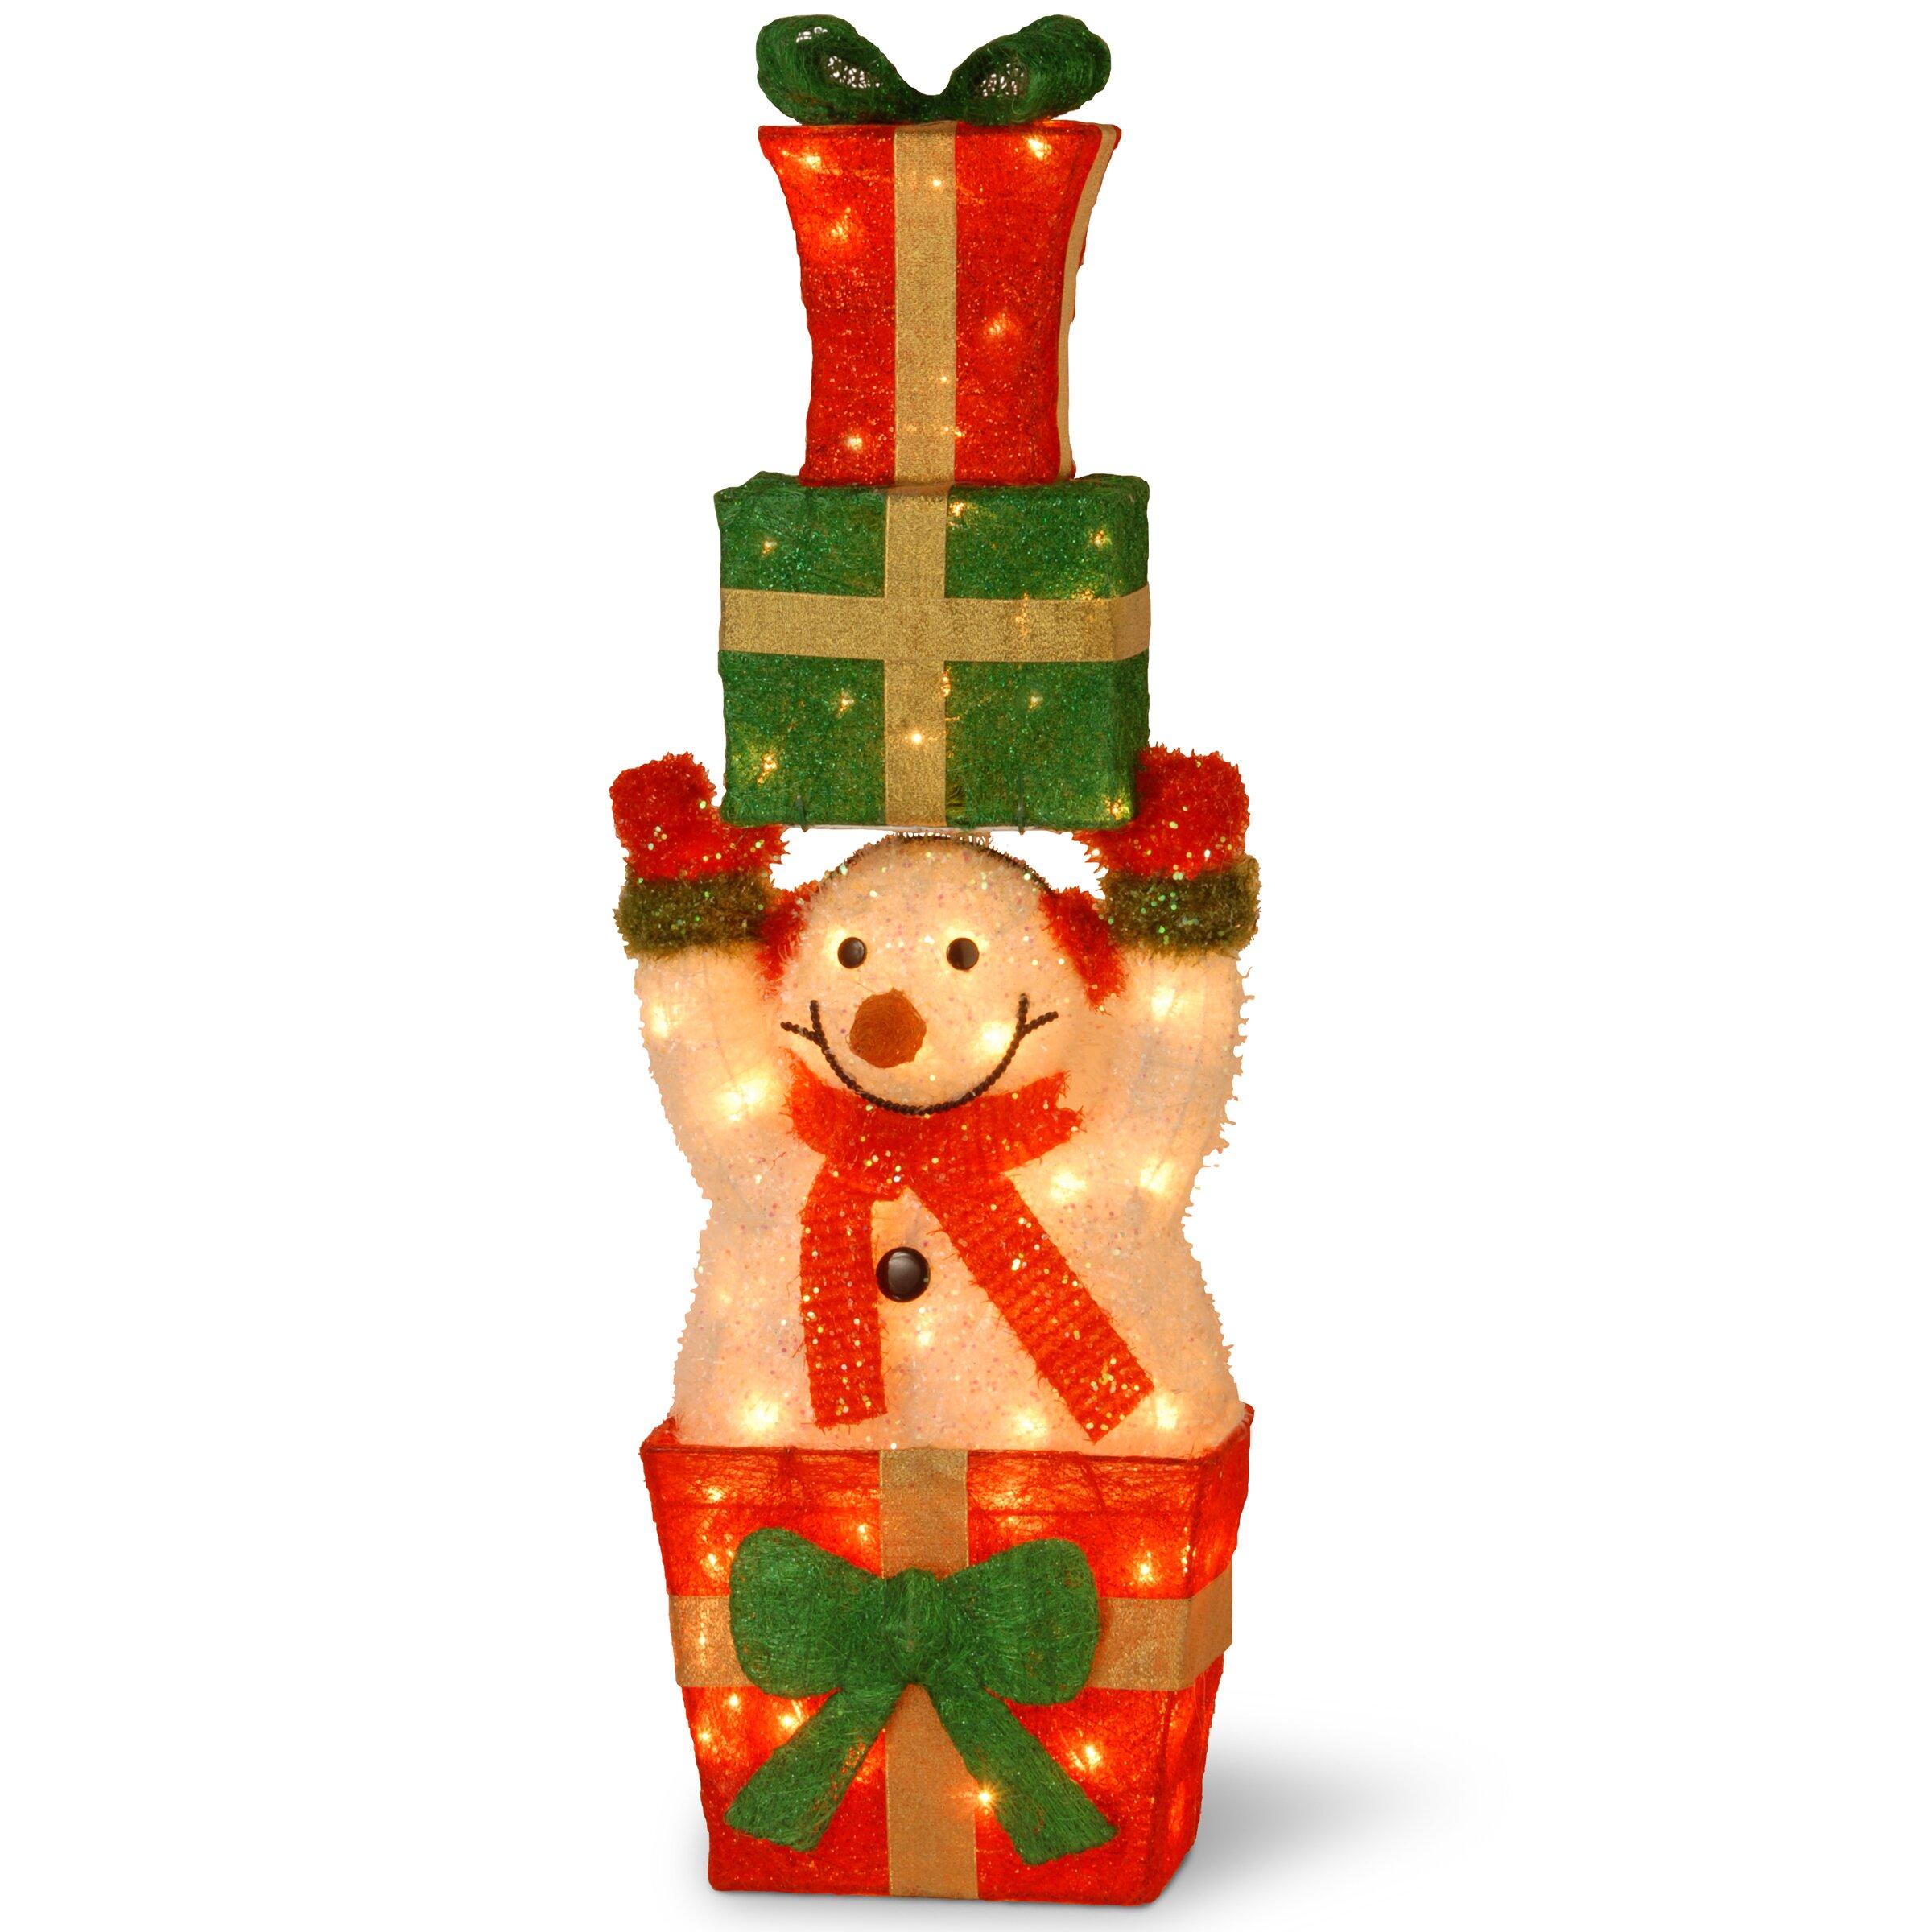 Decorate Christmas Tree Like Snowman: National Tree Co. Decorative Décor Pre-Lit Snowman Holding